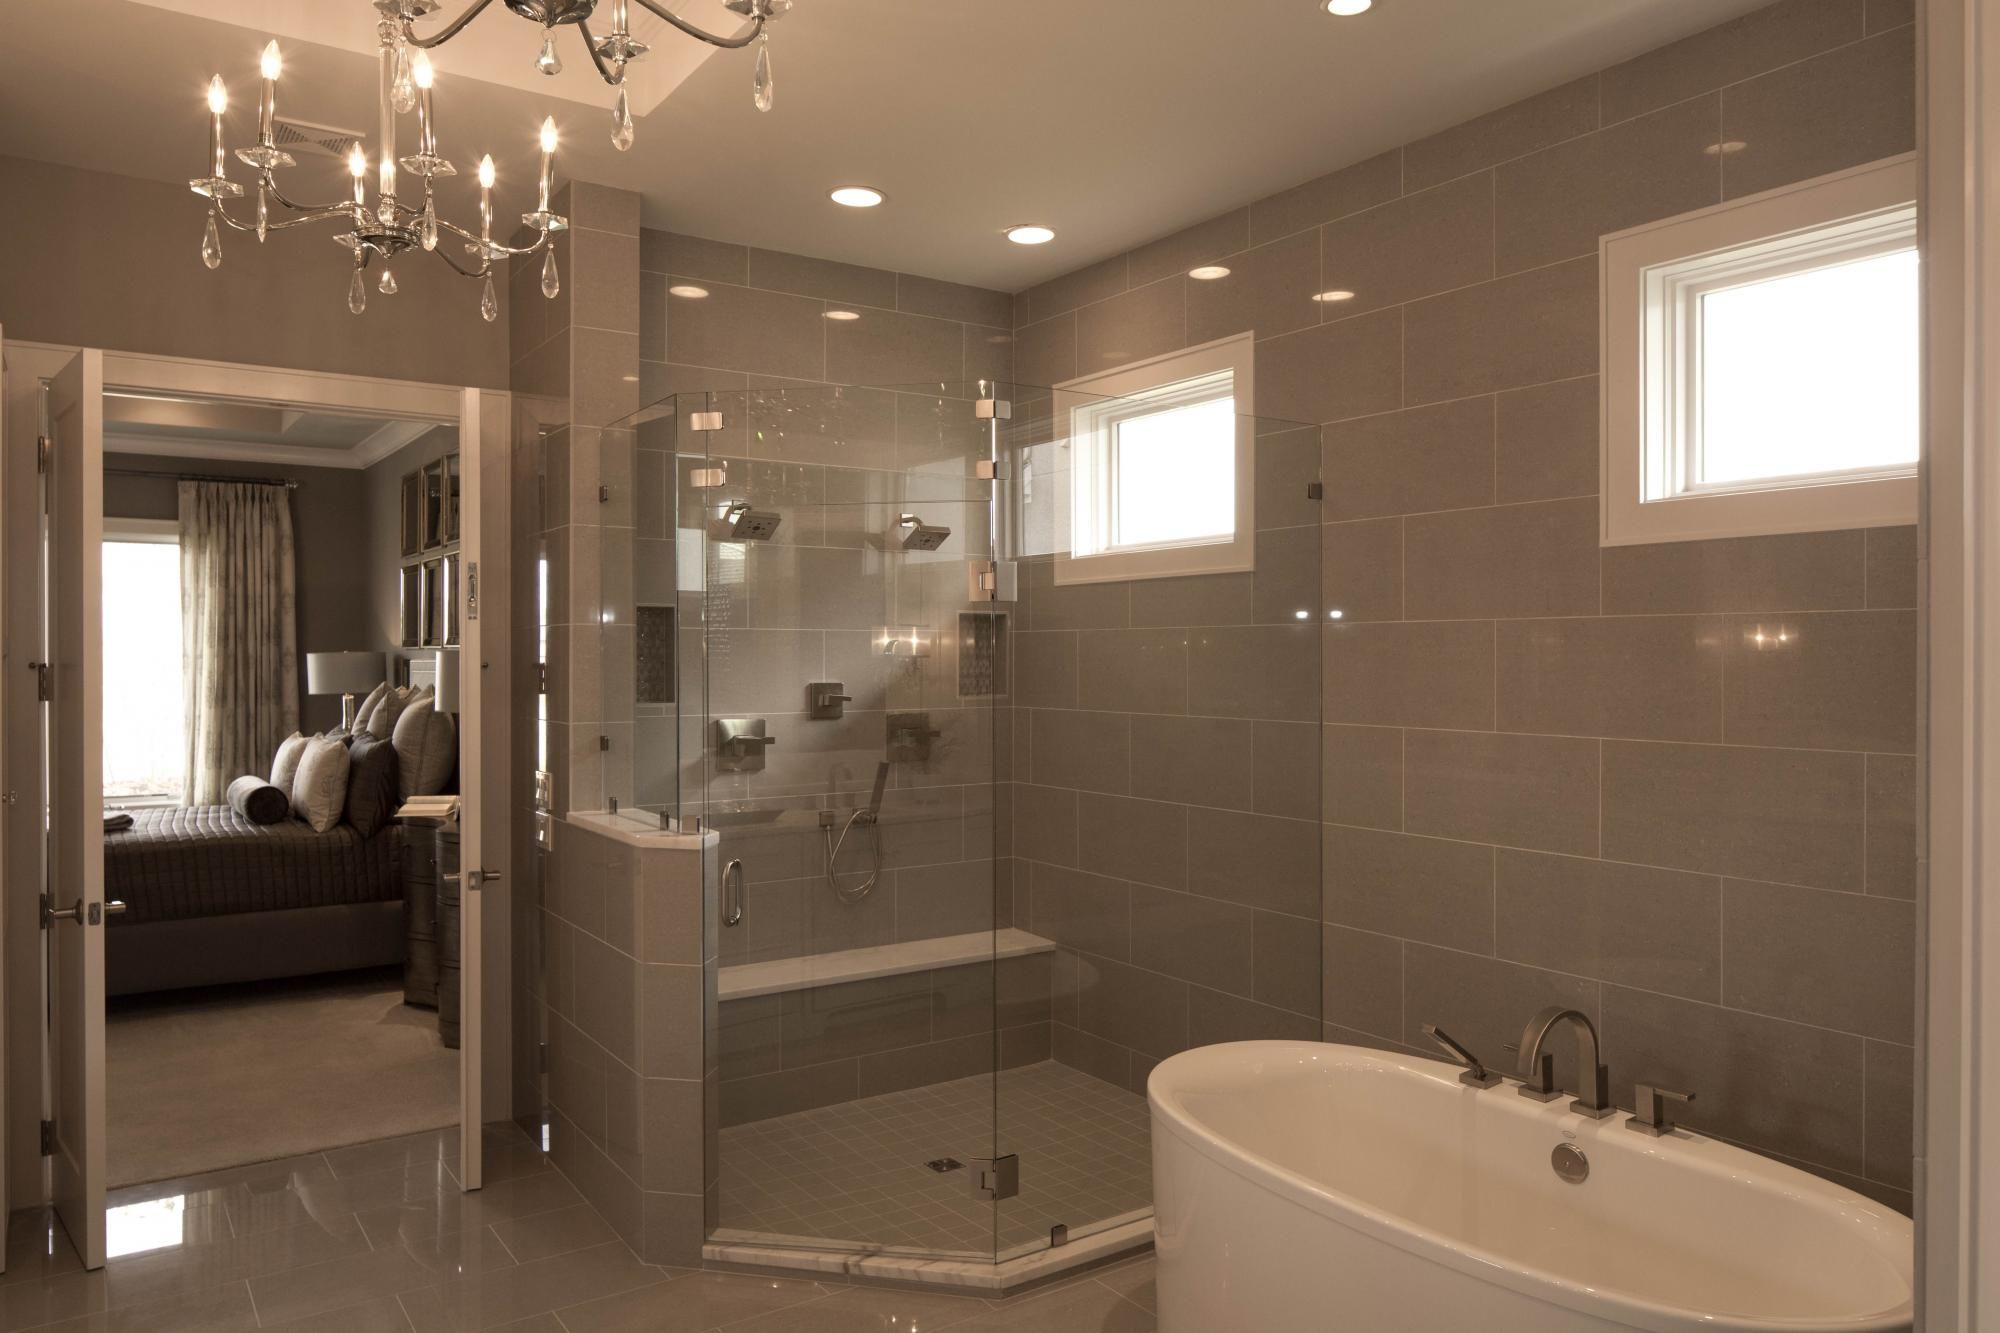 Photo Gallery Kansas City Home Builders J S Robinson Bathroom Photos Home Builders Bathrooms Remodel [ jpg ]